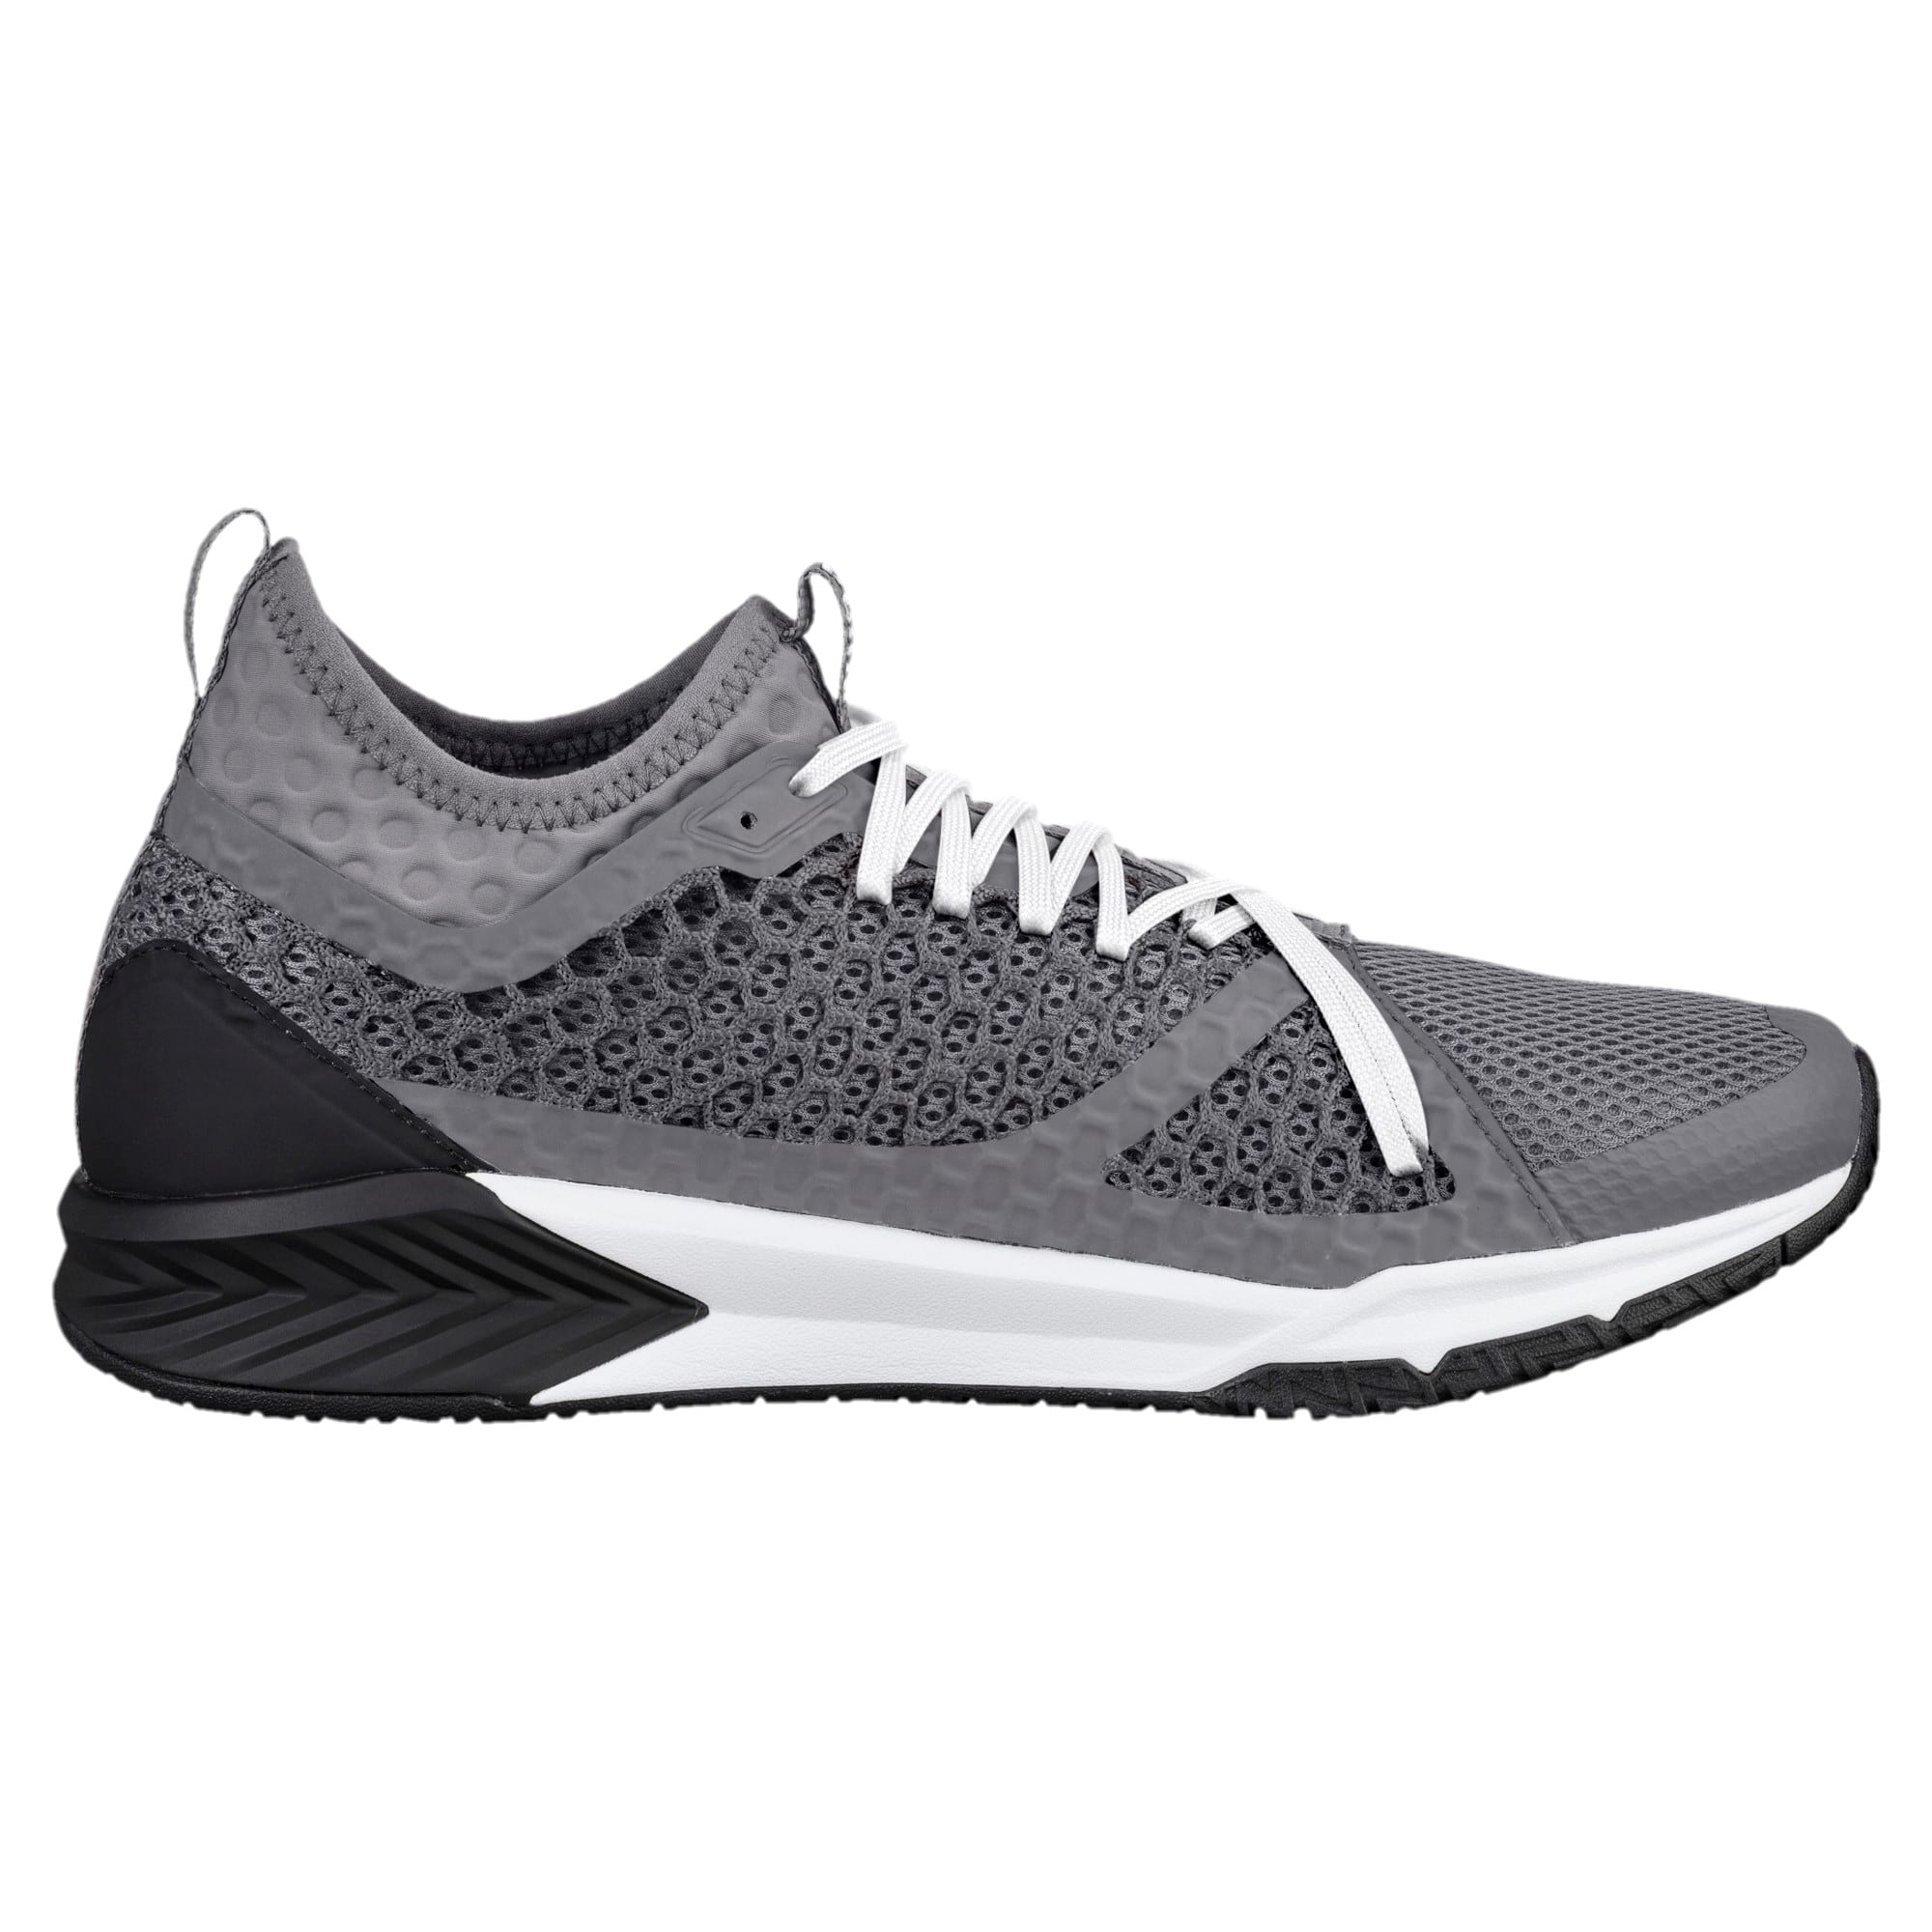 Thumbnail 3 of IGNITE XT NETFIT Men's Training Shoes, QUIET SHADE-Puma Black, medium-IND